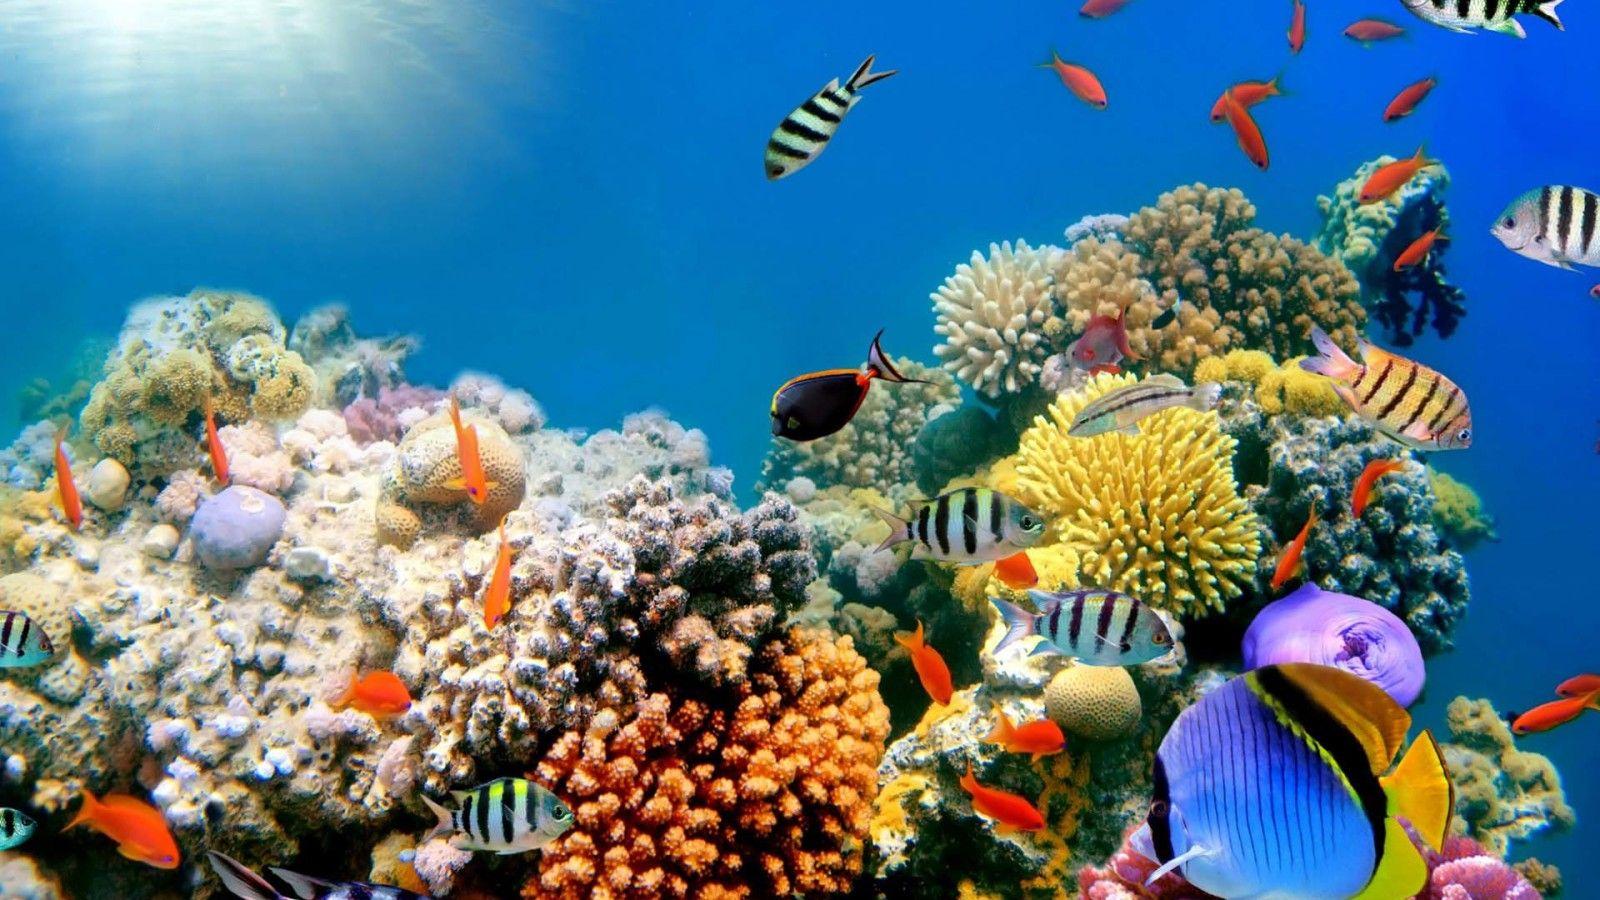 Coral Reefs Wallpapers HD Widescreen Desktop Backgrounds